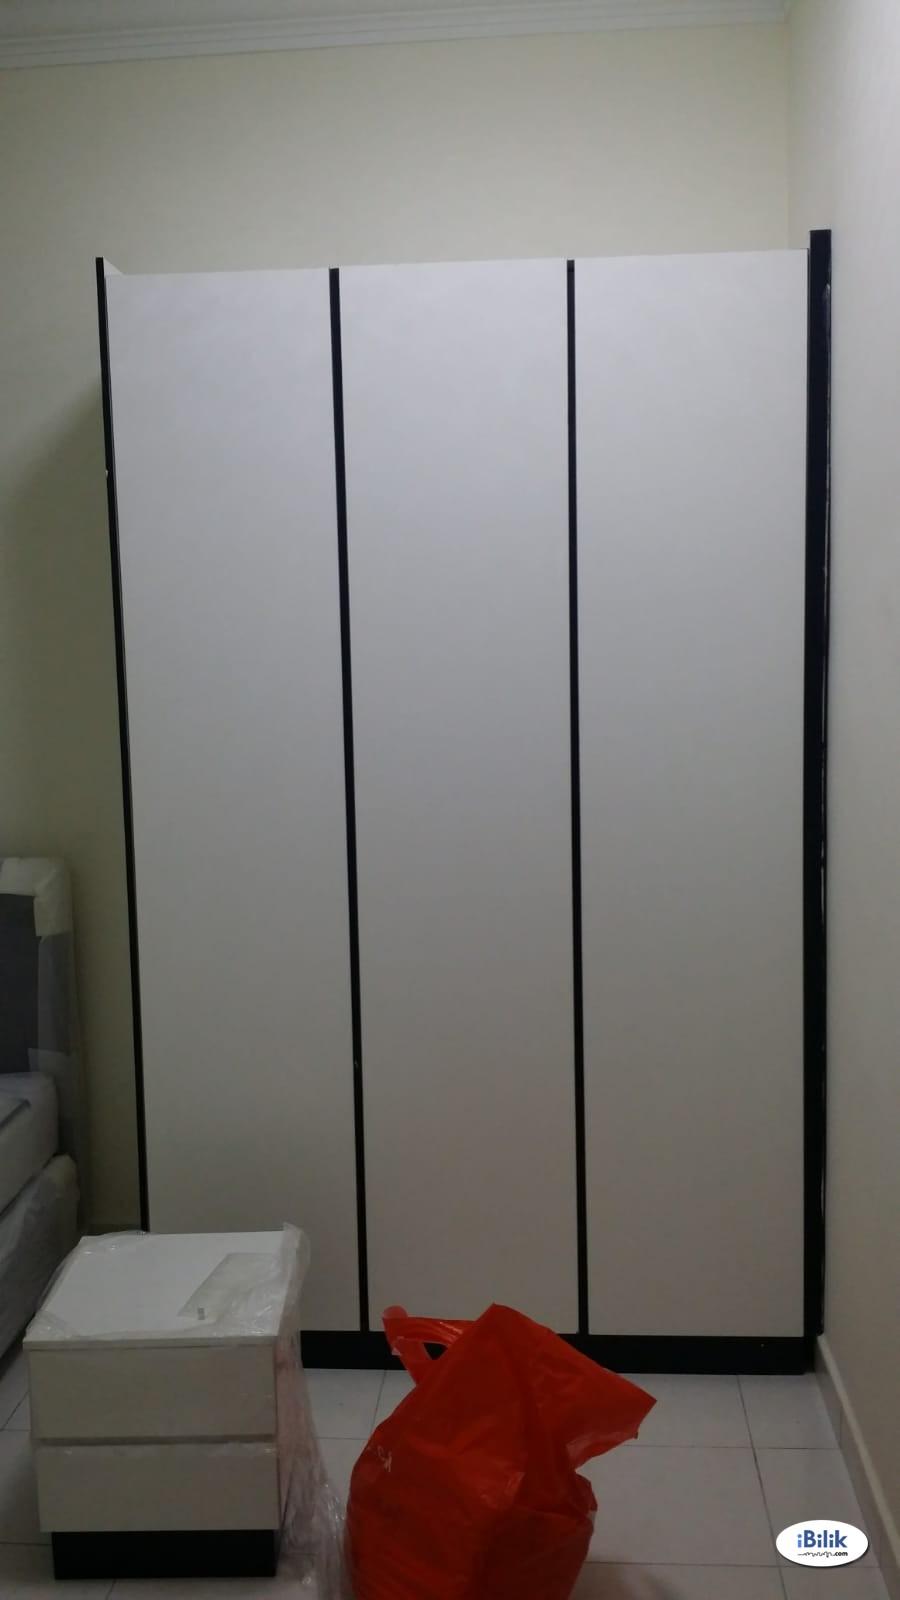 Common Room Fully Furnished SUTERA UTAMA (NO AGENT FEE)